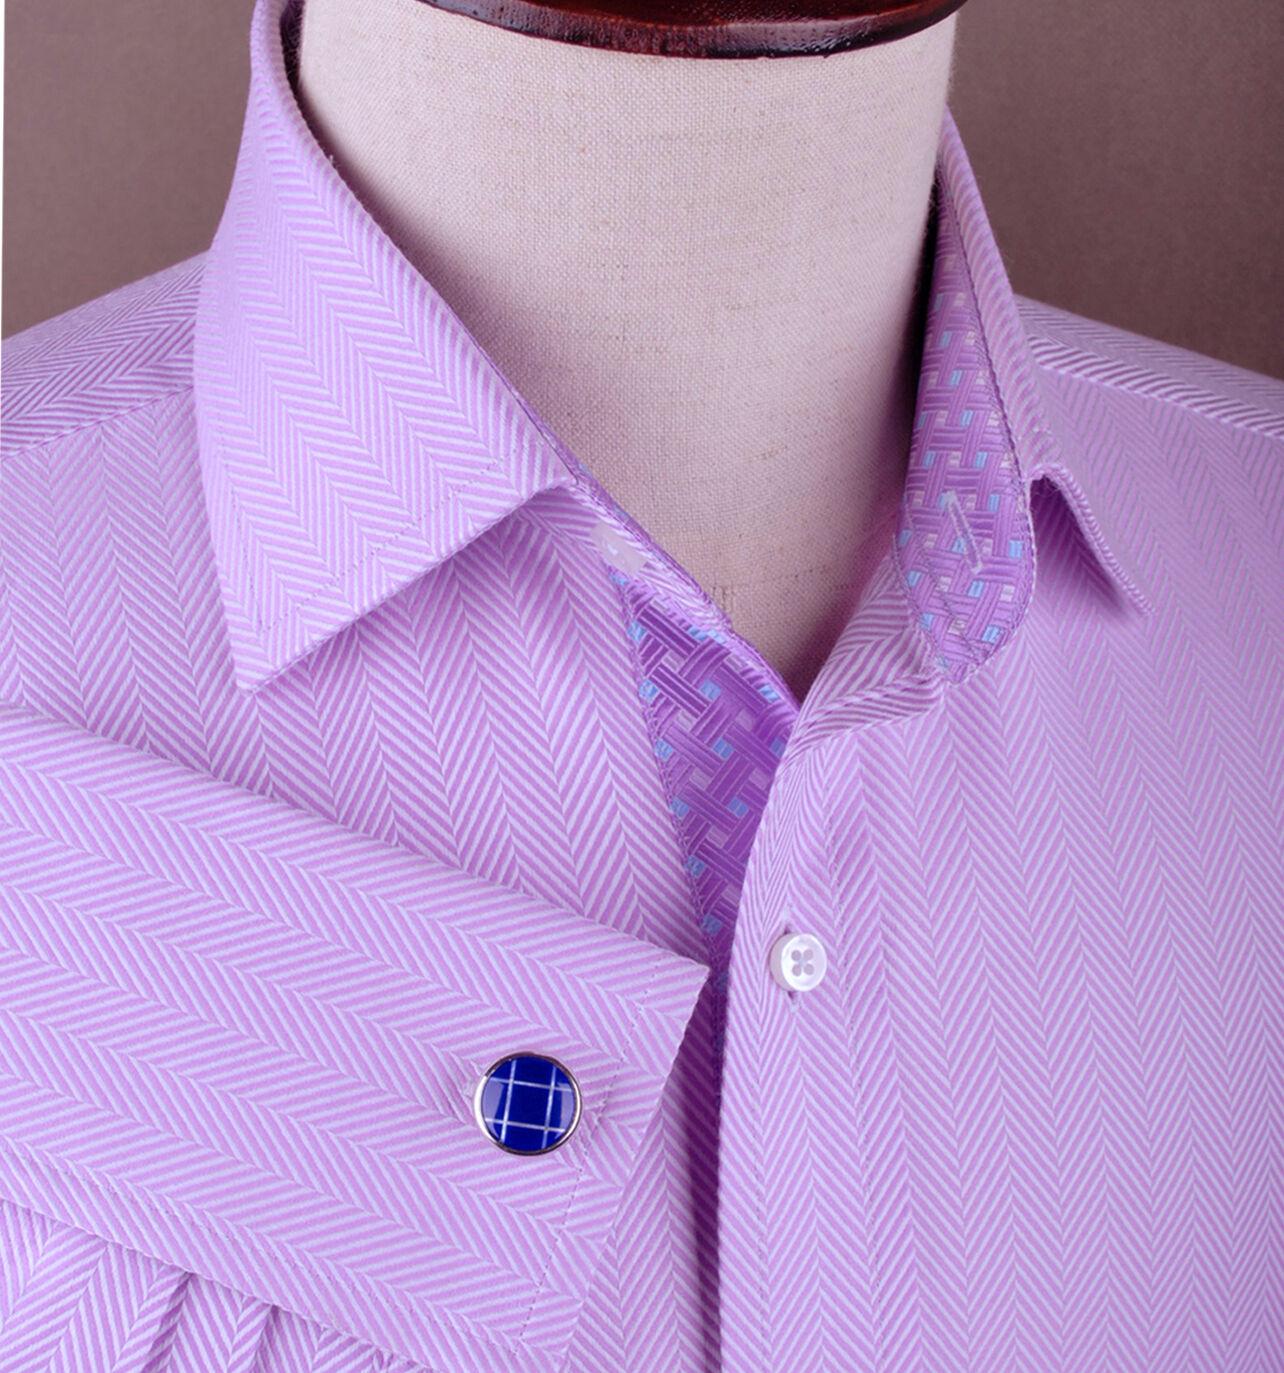 Violet Herringbone Boss lila Designer Luxury Geschäft Dress Shirt Optional Tie